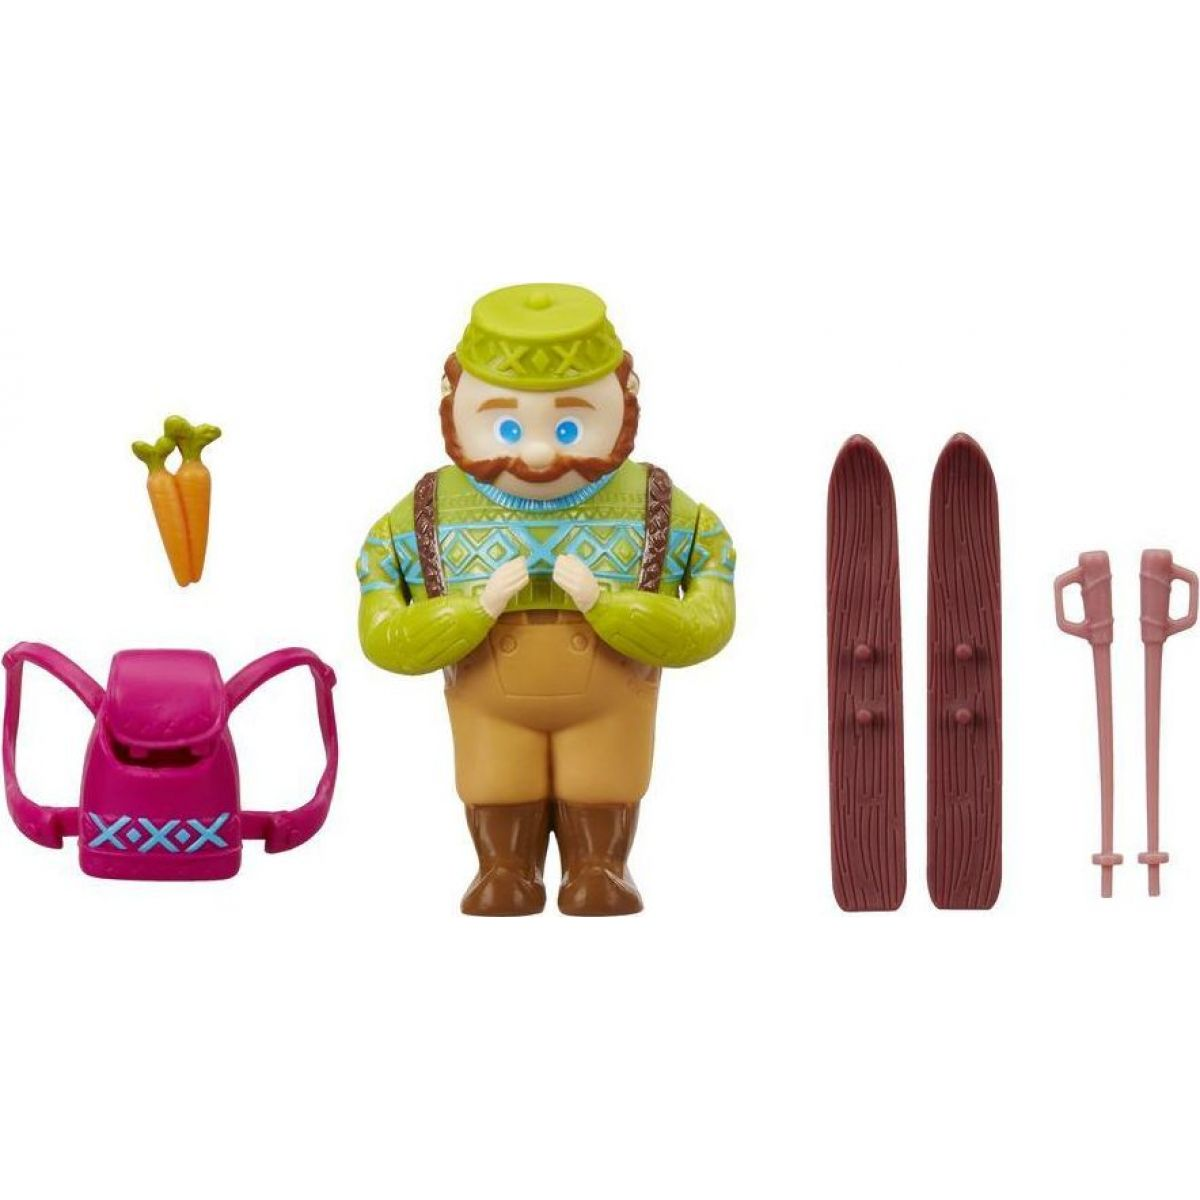 Hasbro Disney Frozen Little Kingdom Mini panenka s kamarádem Oaken's Ski Trip